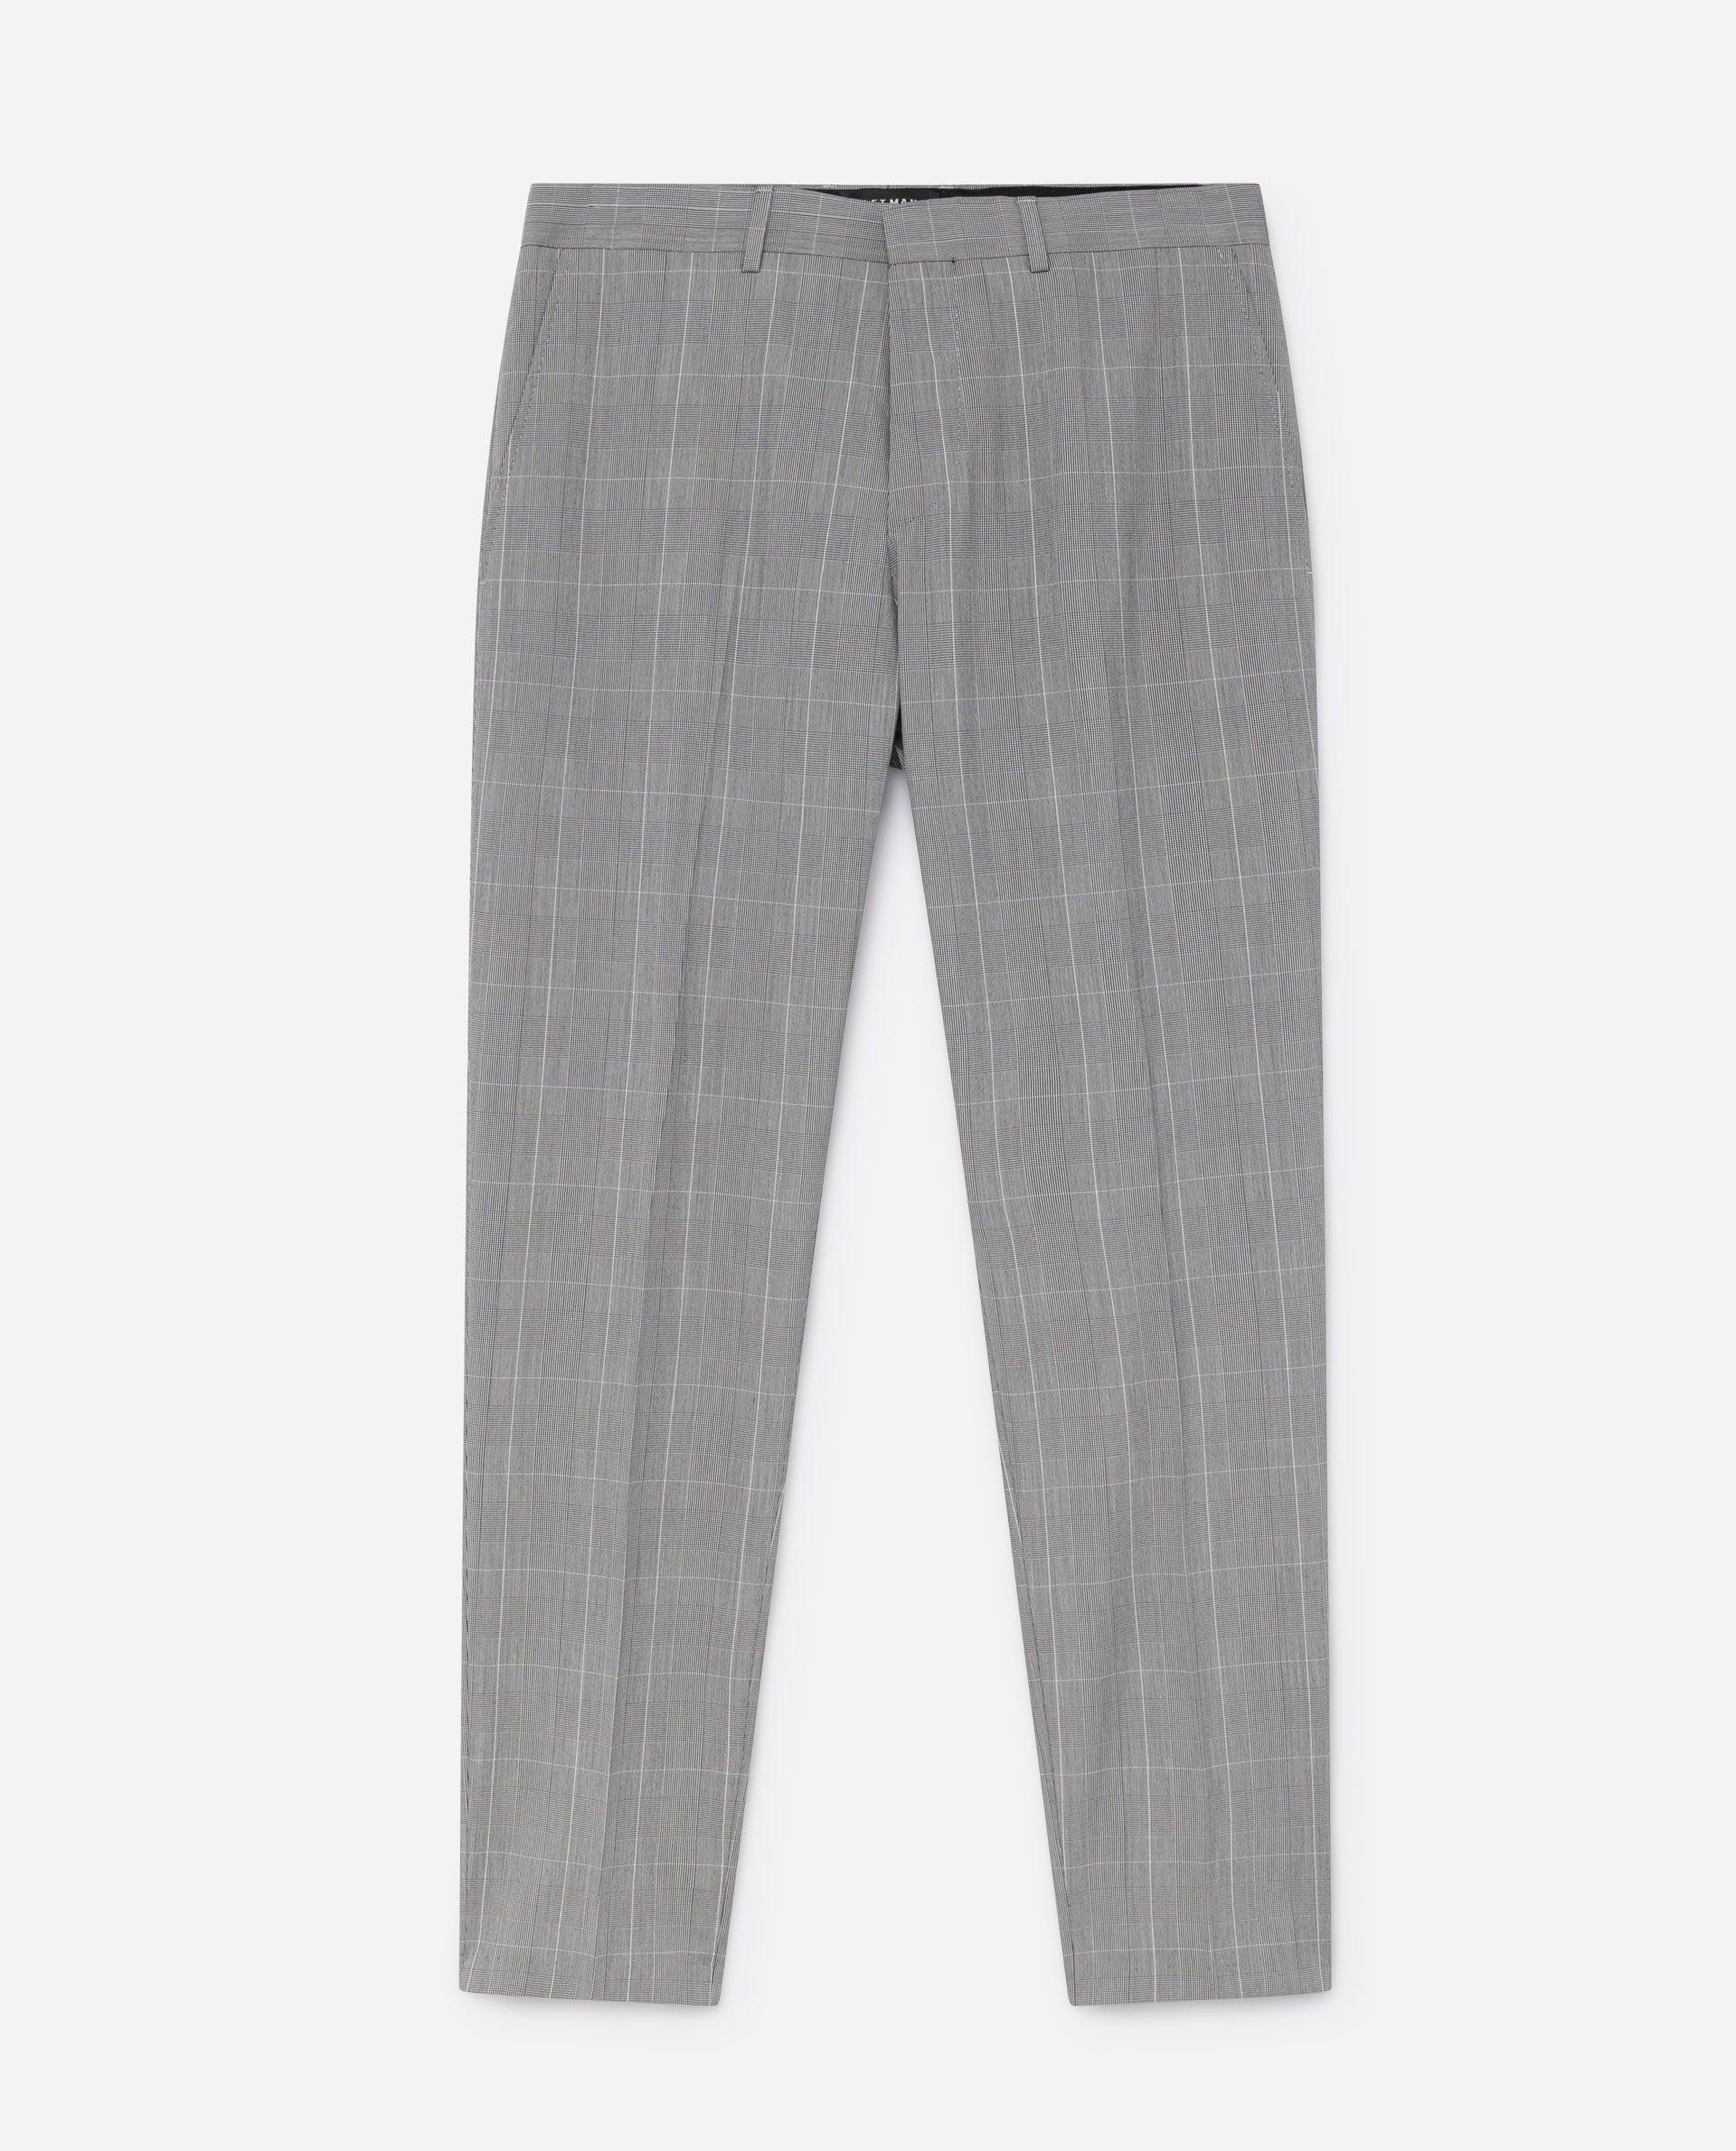 nuevo estilo 08bf7 8f446 Pantalón cuadro ventana | REBAJAS en 2019 | Pantalones ...